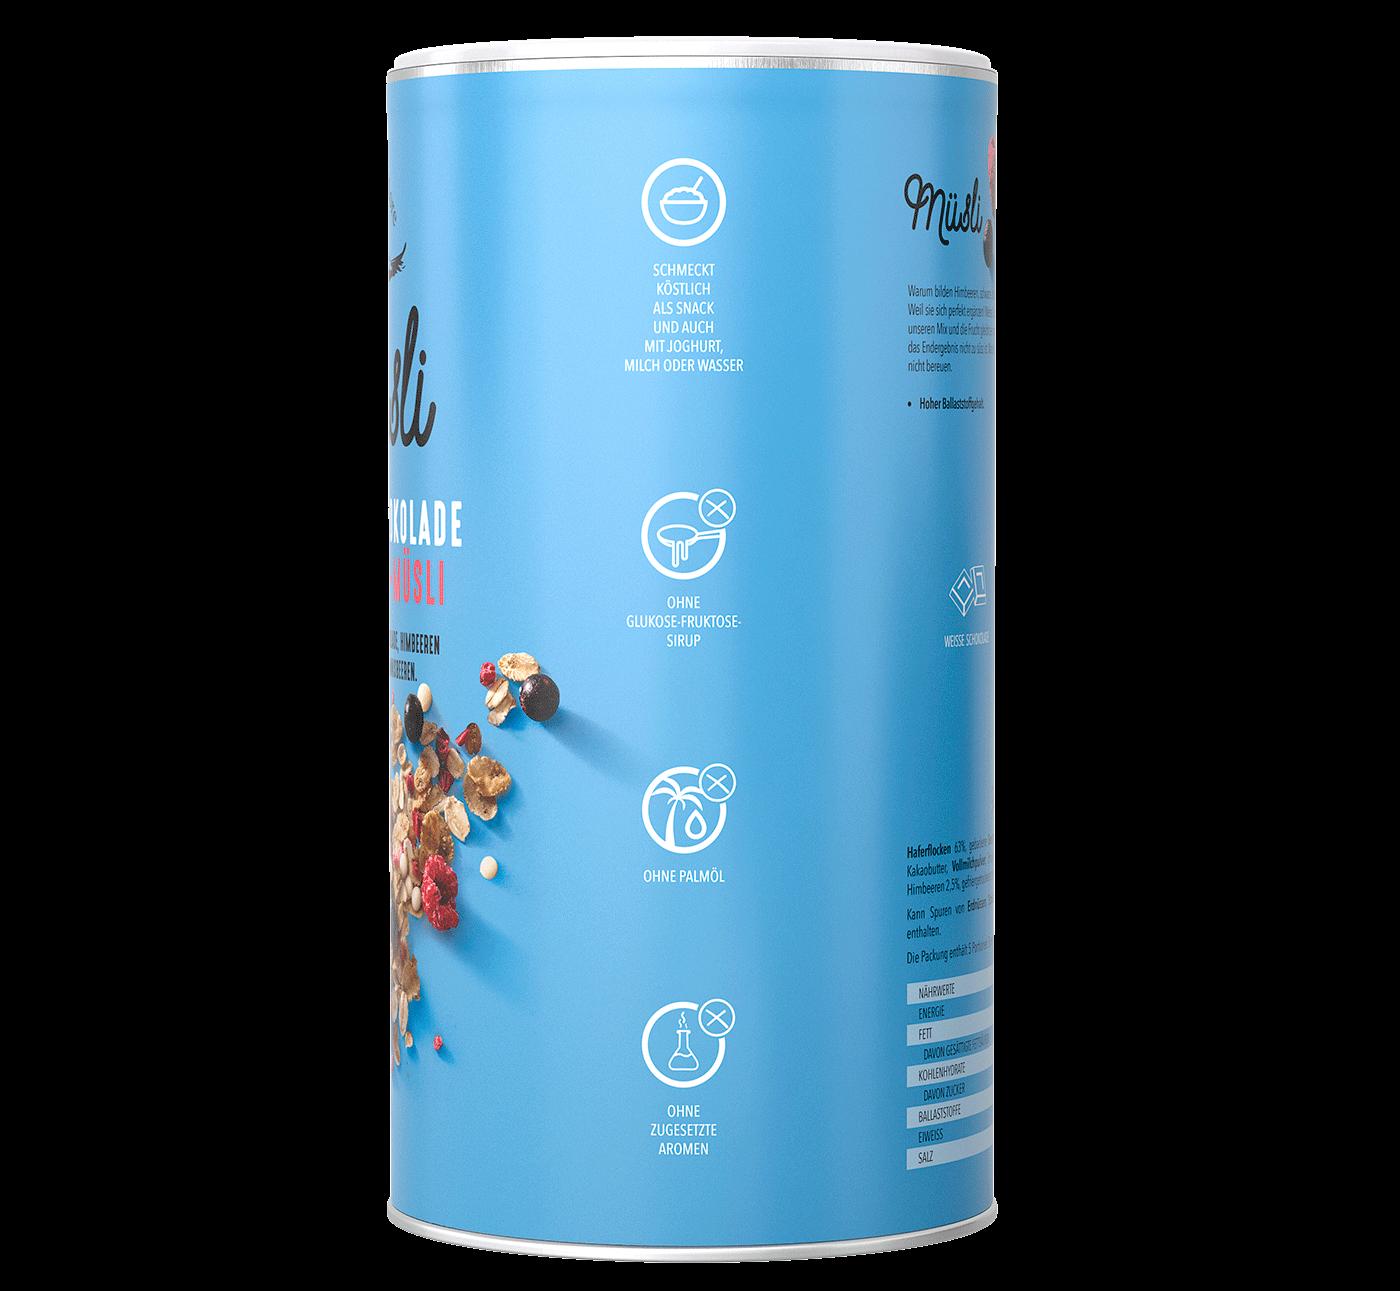 weisse-schokolade-fruechte-musli-onedaymore-bok-tuba-1400×1291